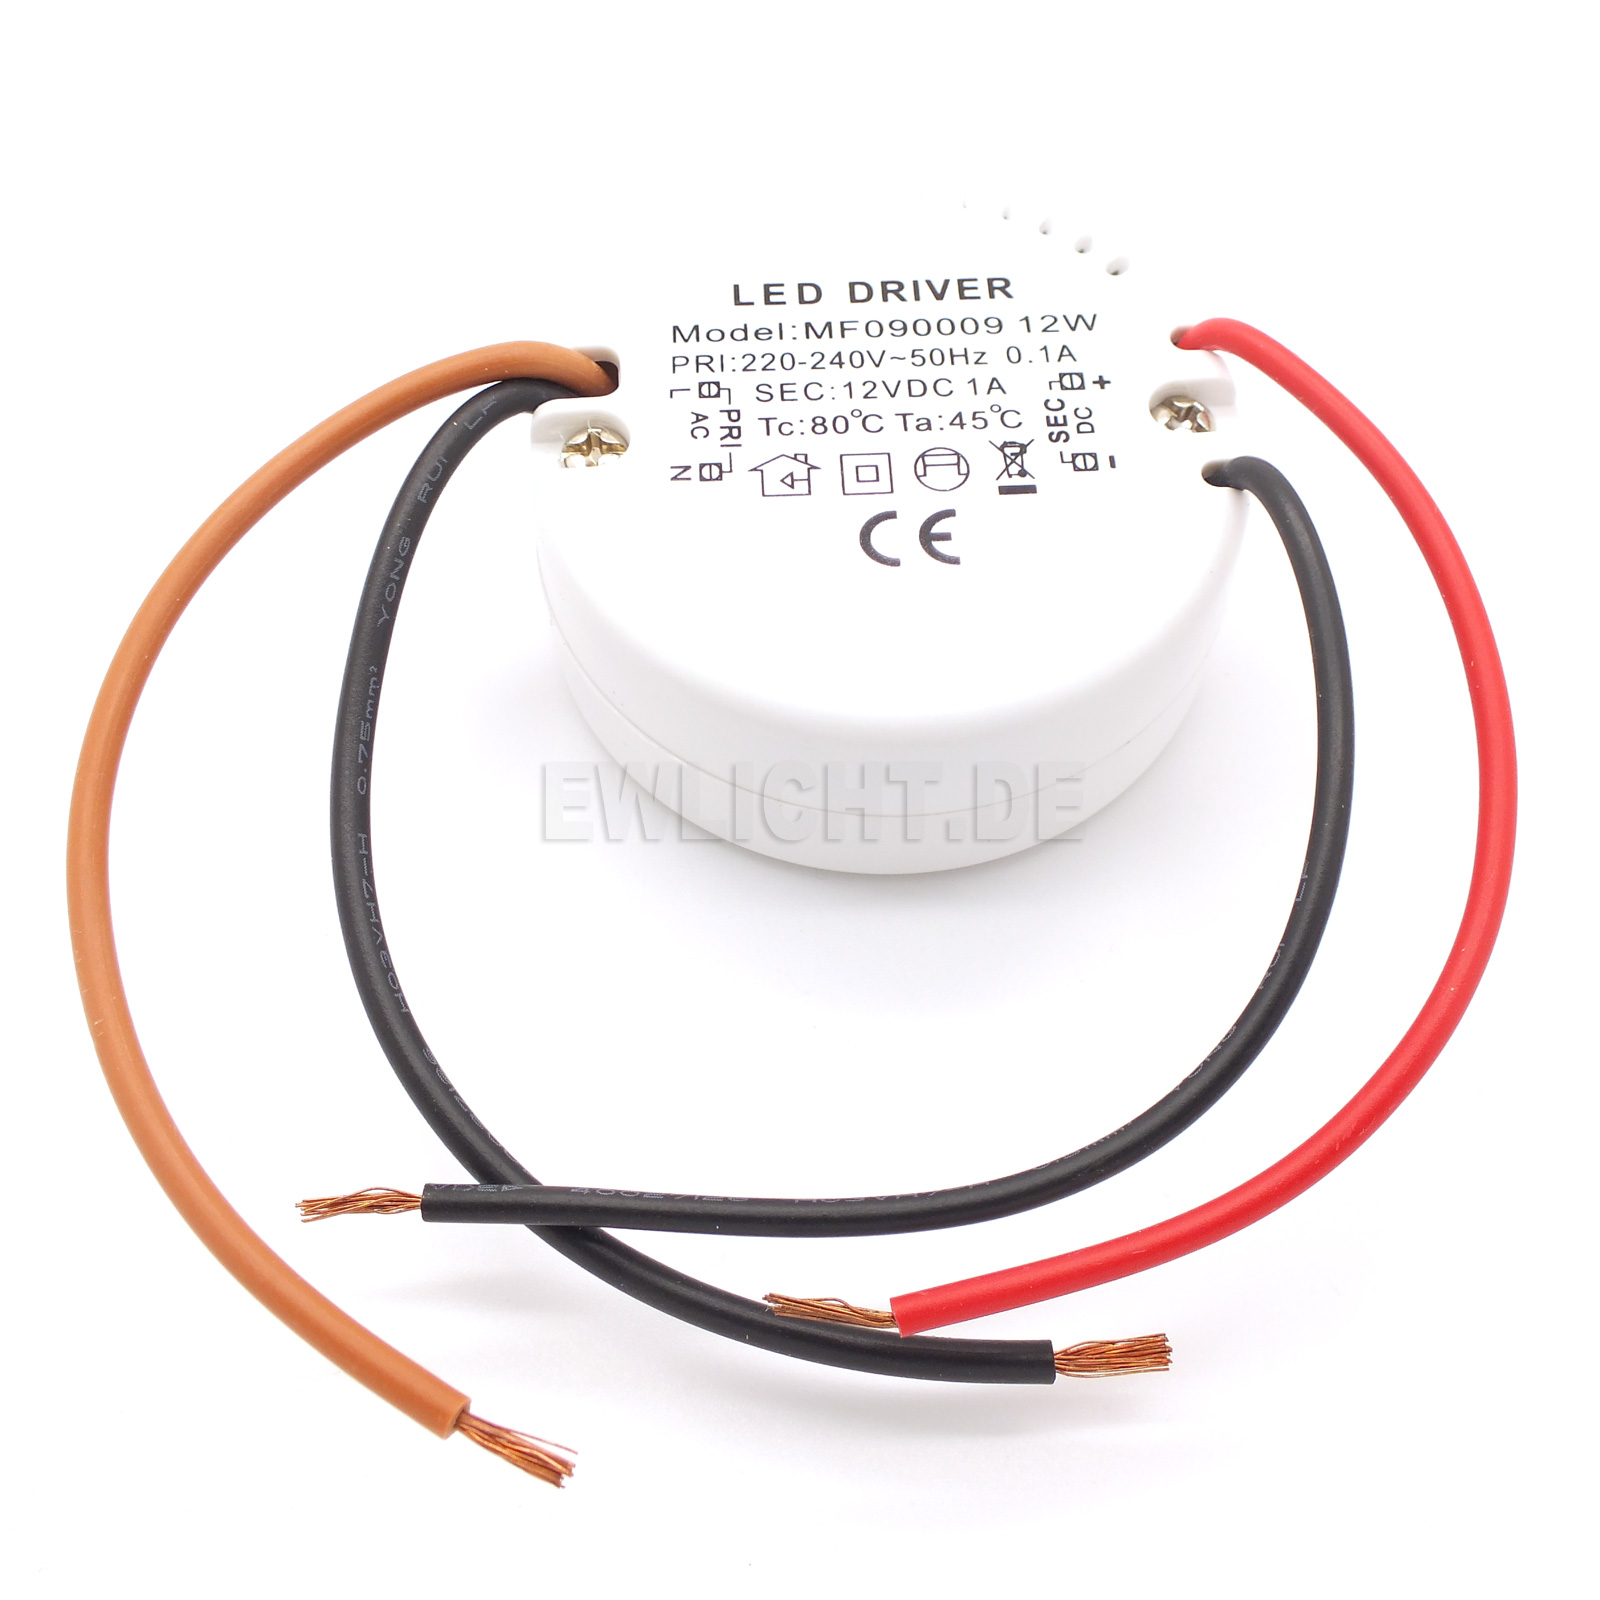 LED Trafo 12V